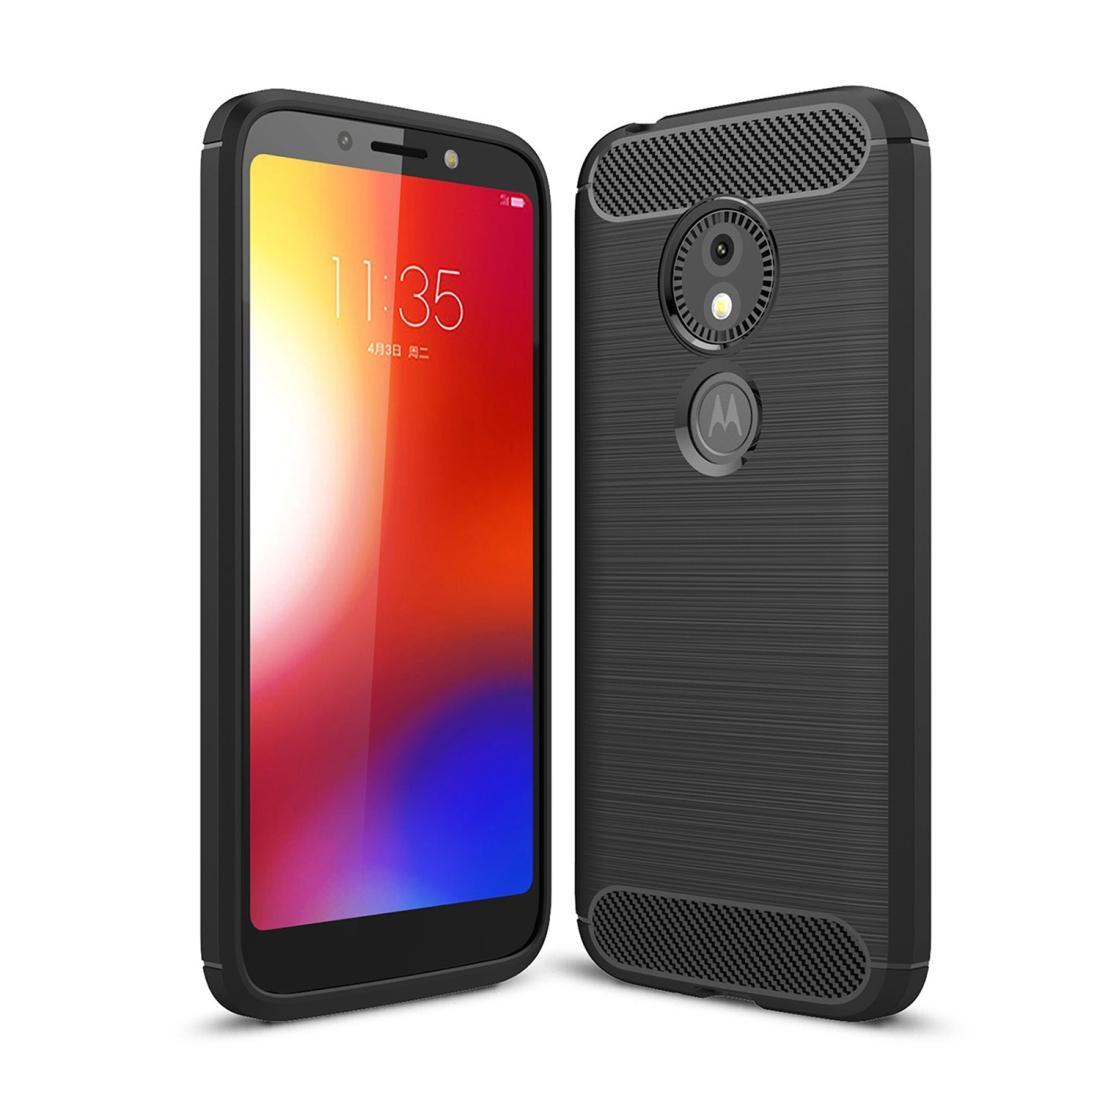 For Motorola Moto E5 Play Brushed Texture Carbon Fiber Shockproof TPU Protective Back Case (Black